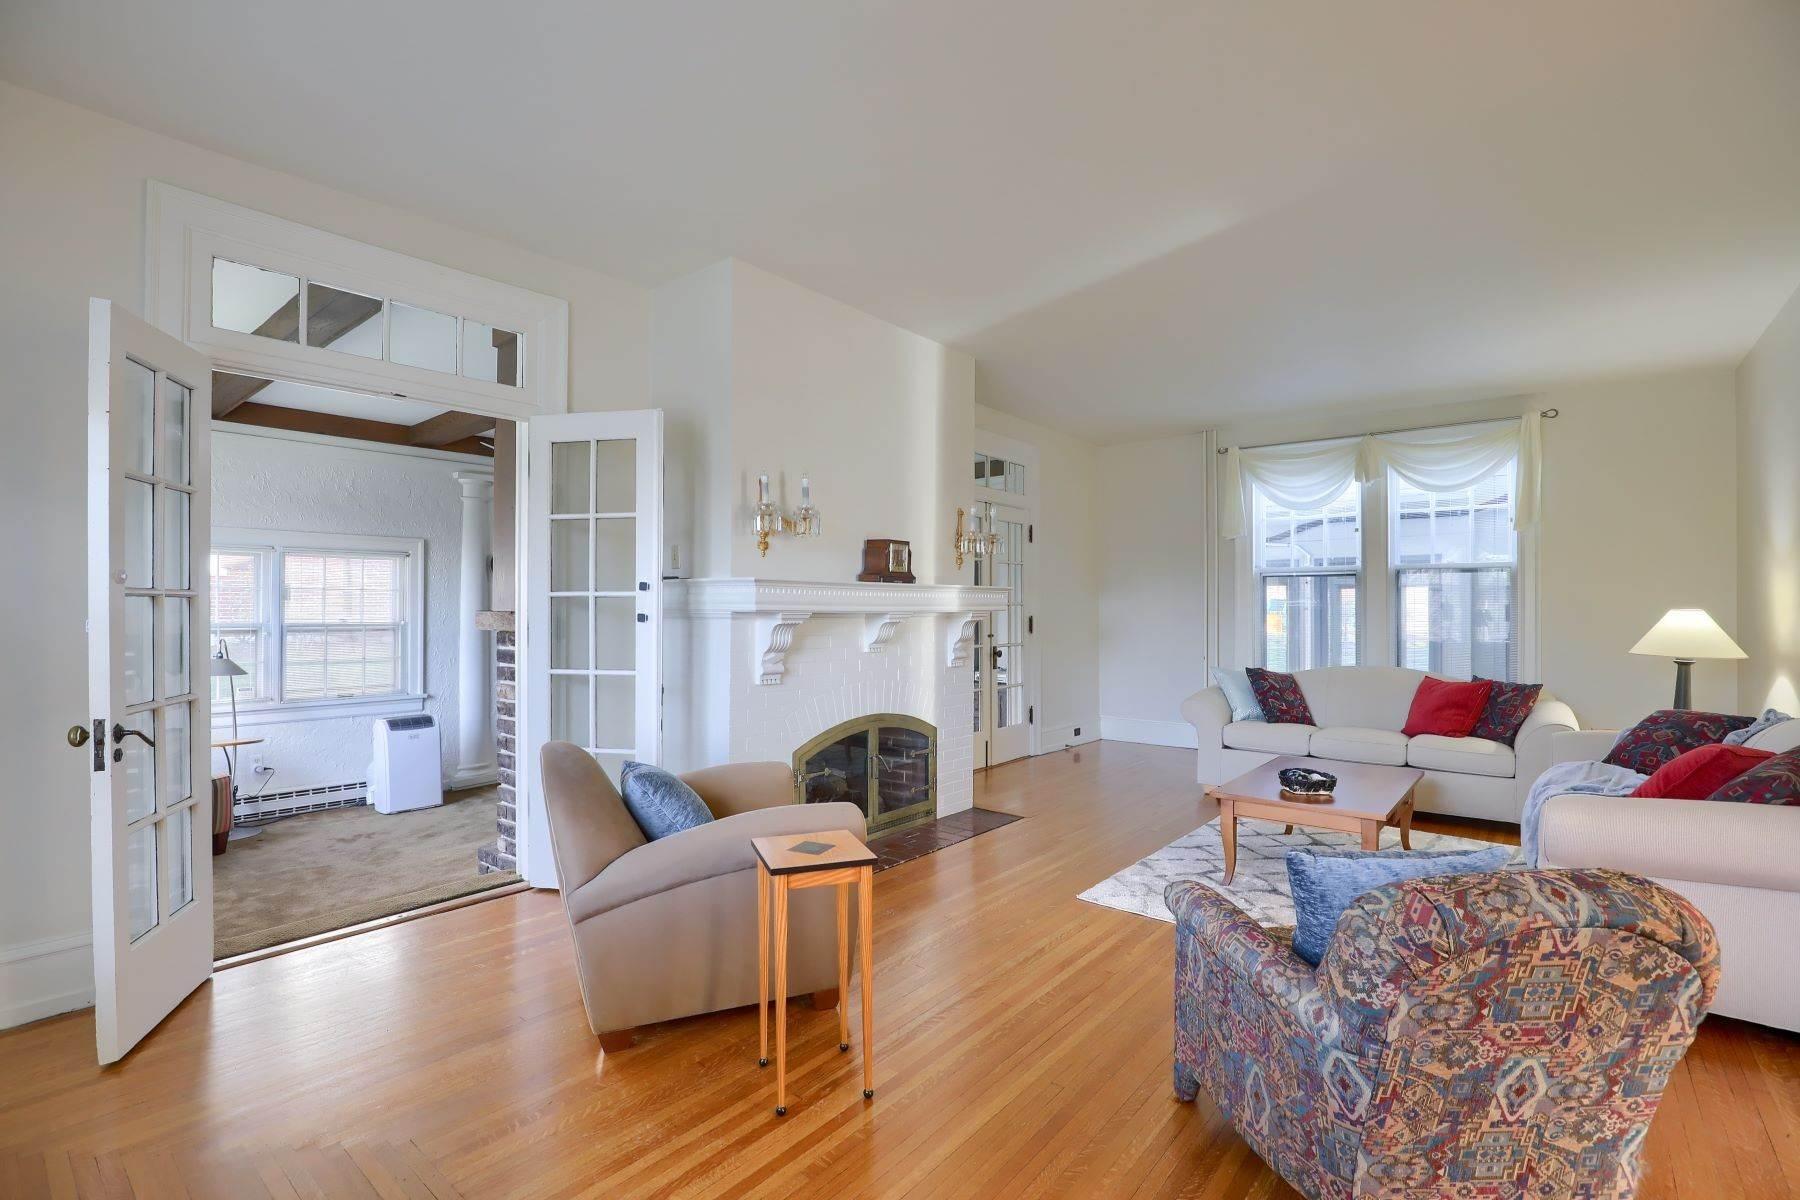 12. Single Family Homes for Sale at 206 E Granada Ave Hershey, Pennsylvania 17033 United States